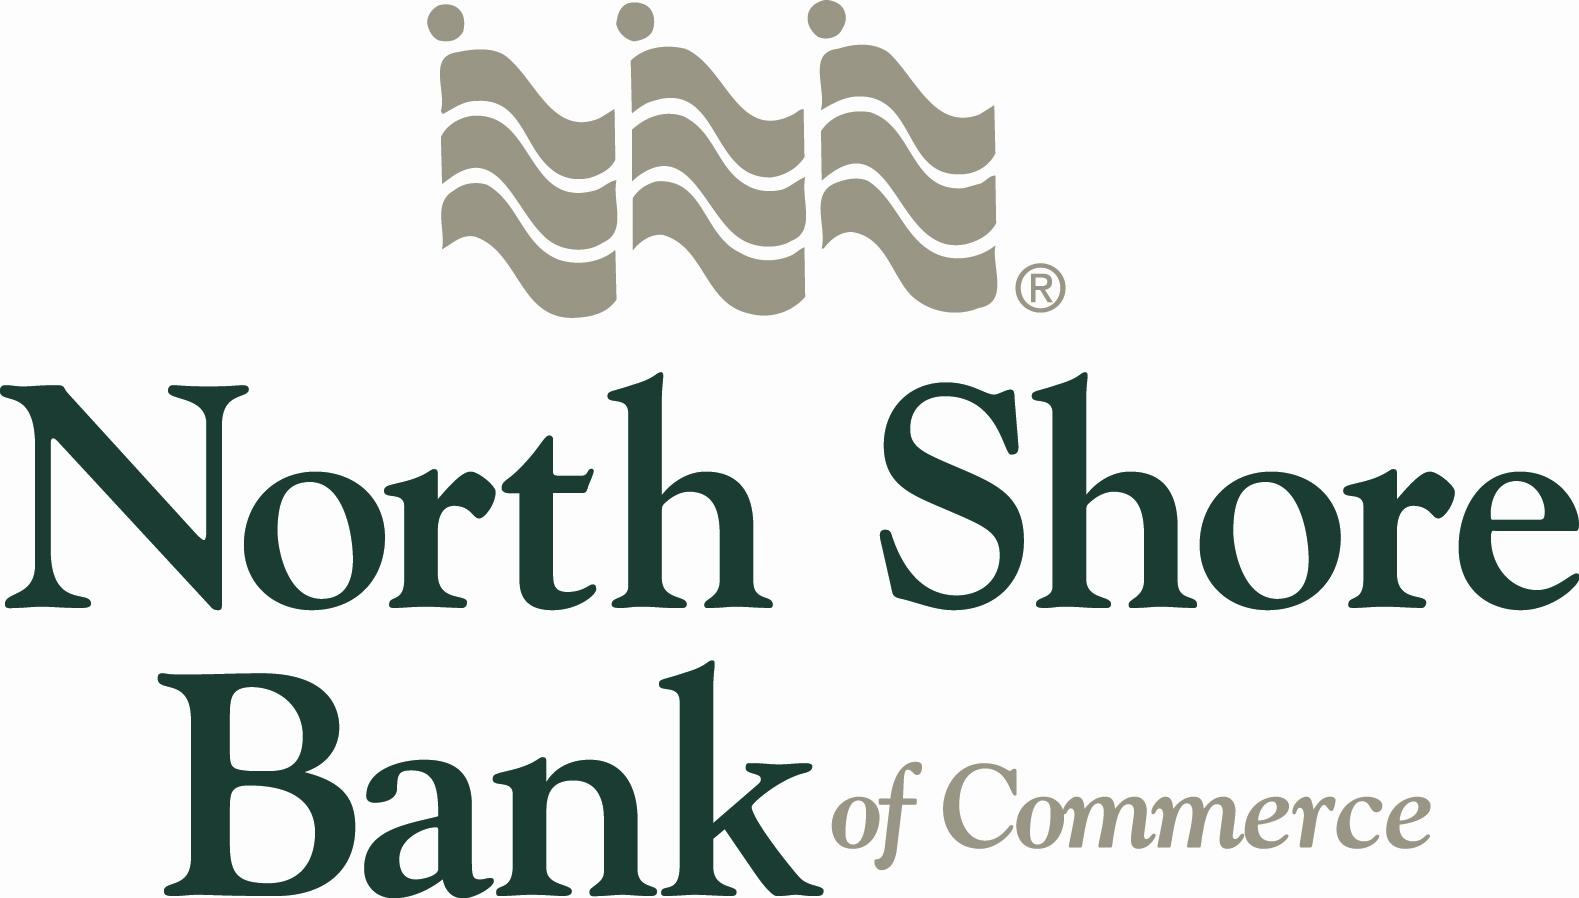 Golf-2011-North-Shore-Bank-of-Commerce-3-2011